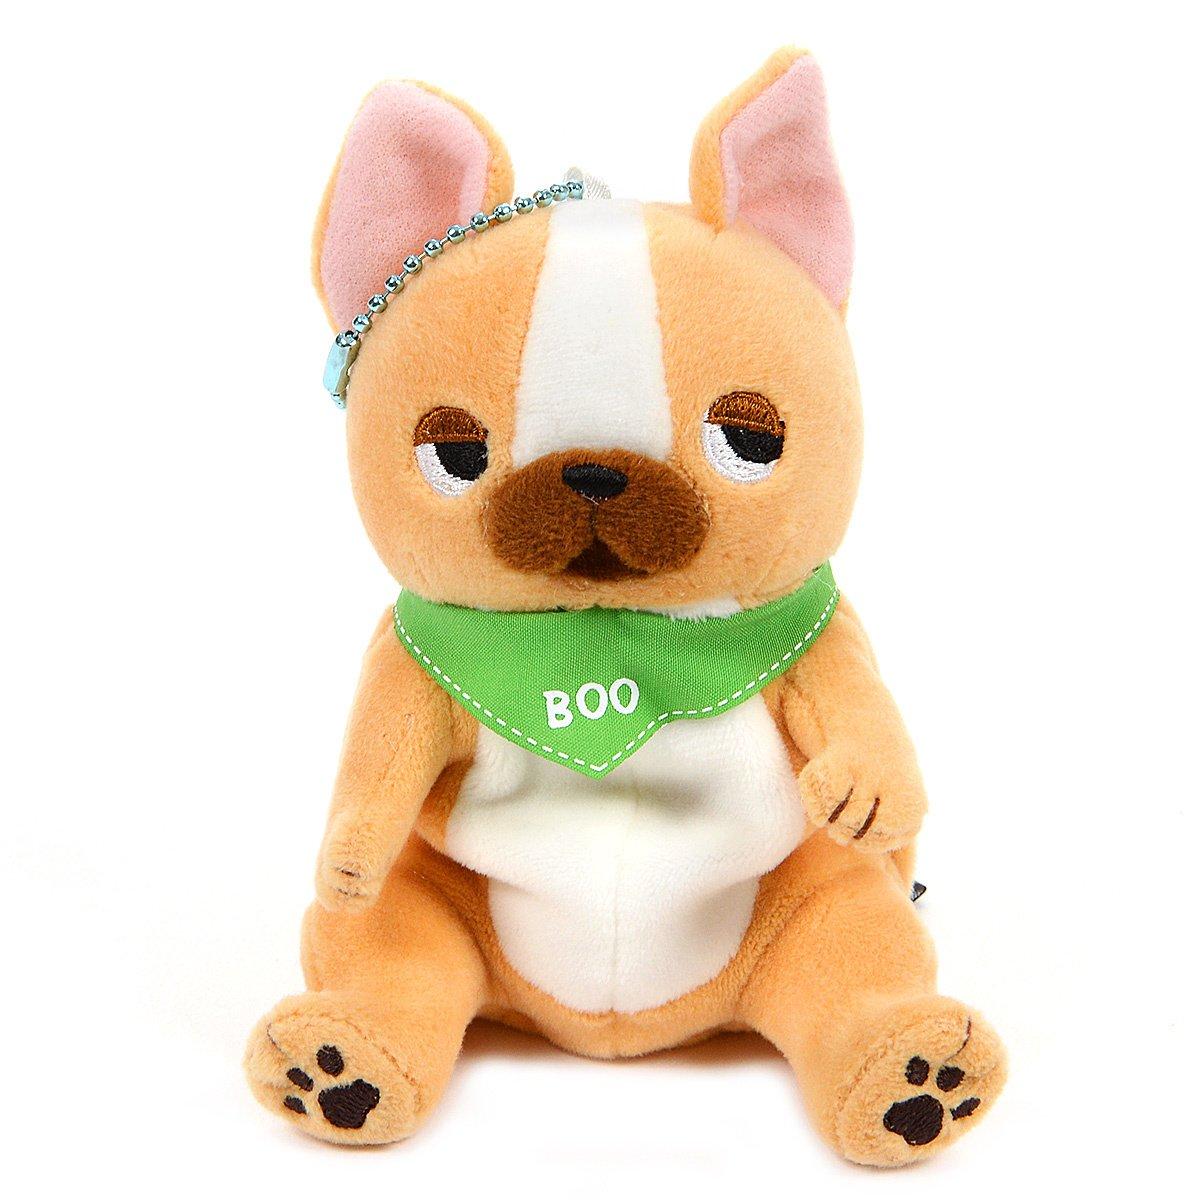 Plush Pug, Amuse, Buruburu Boo!, Gabugabu, Brown, 4 Inches